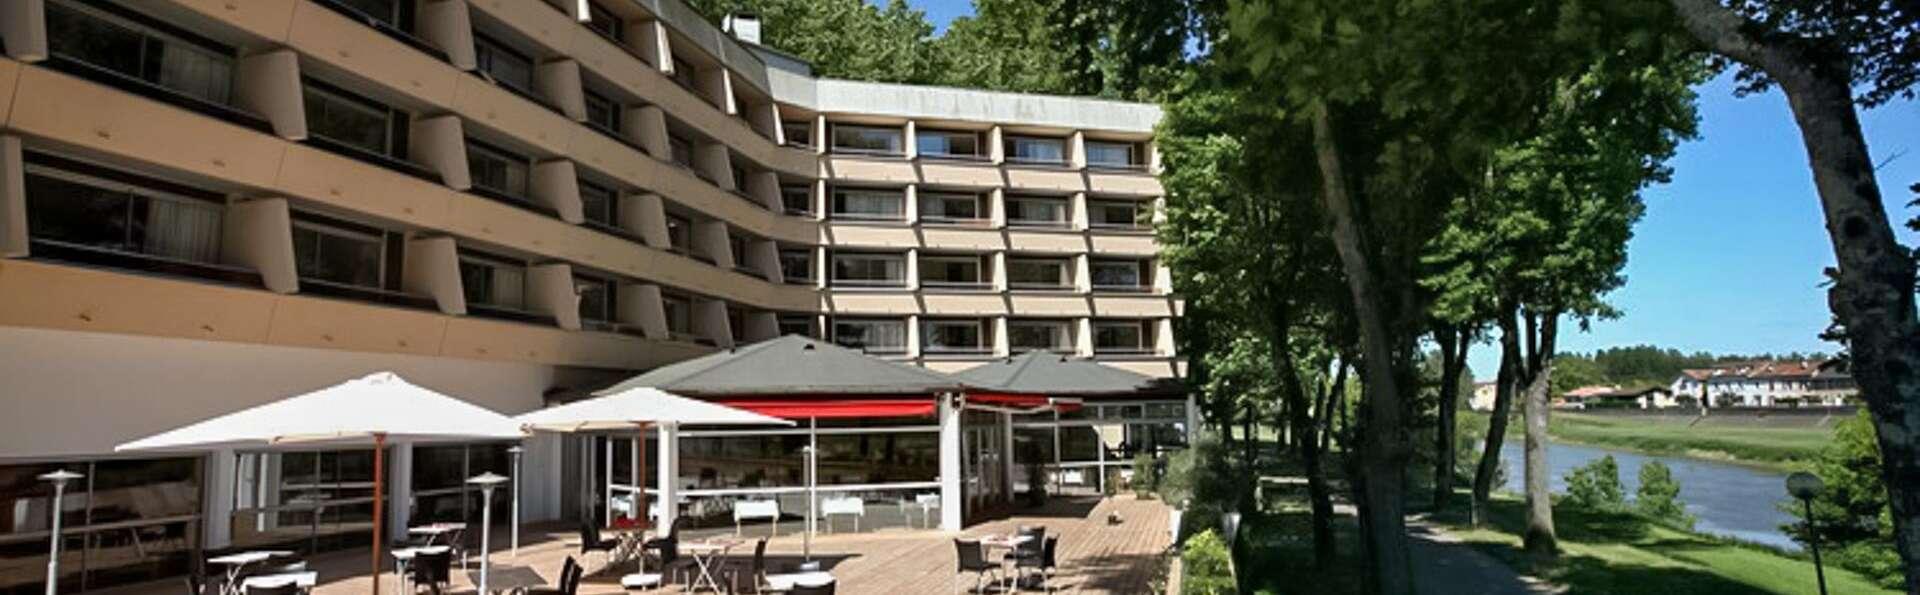 Dax Hotel - EDIT_TERRACE_01.jpg